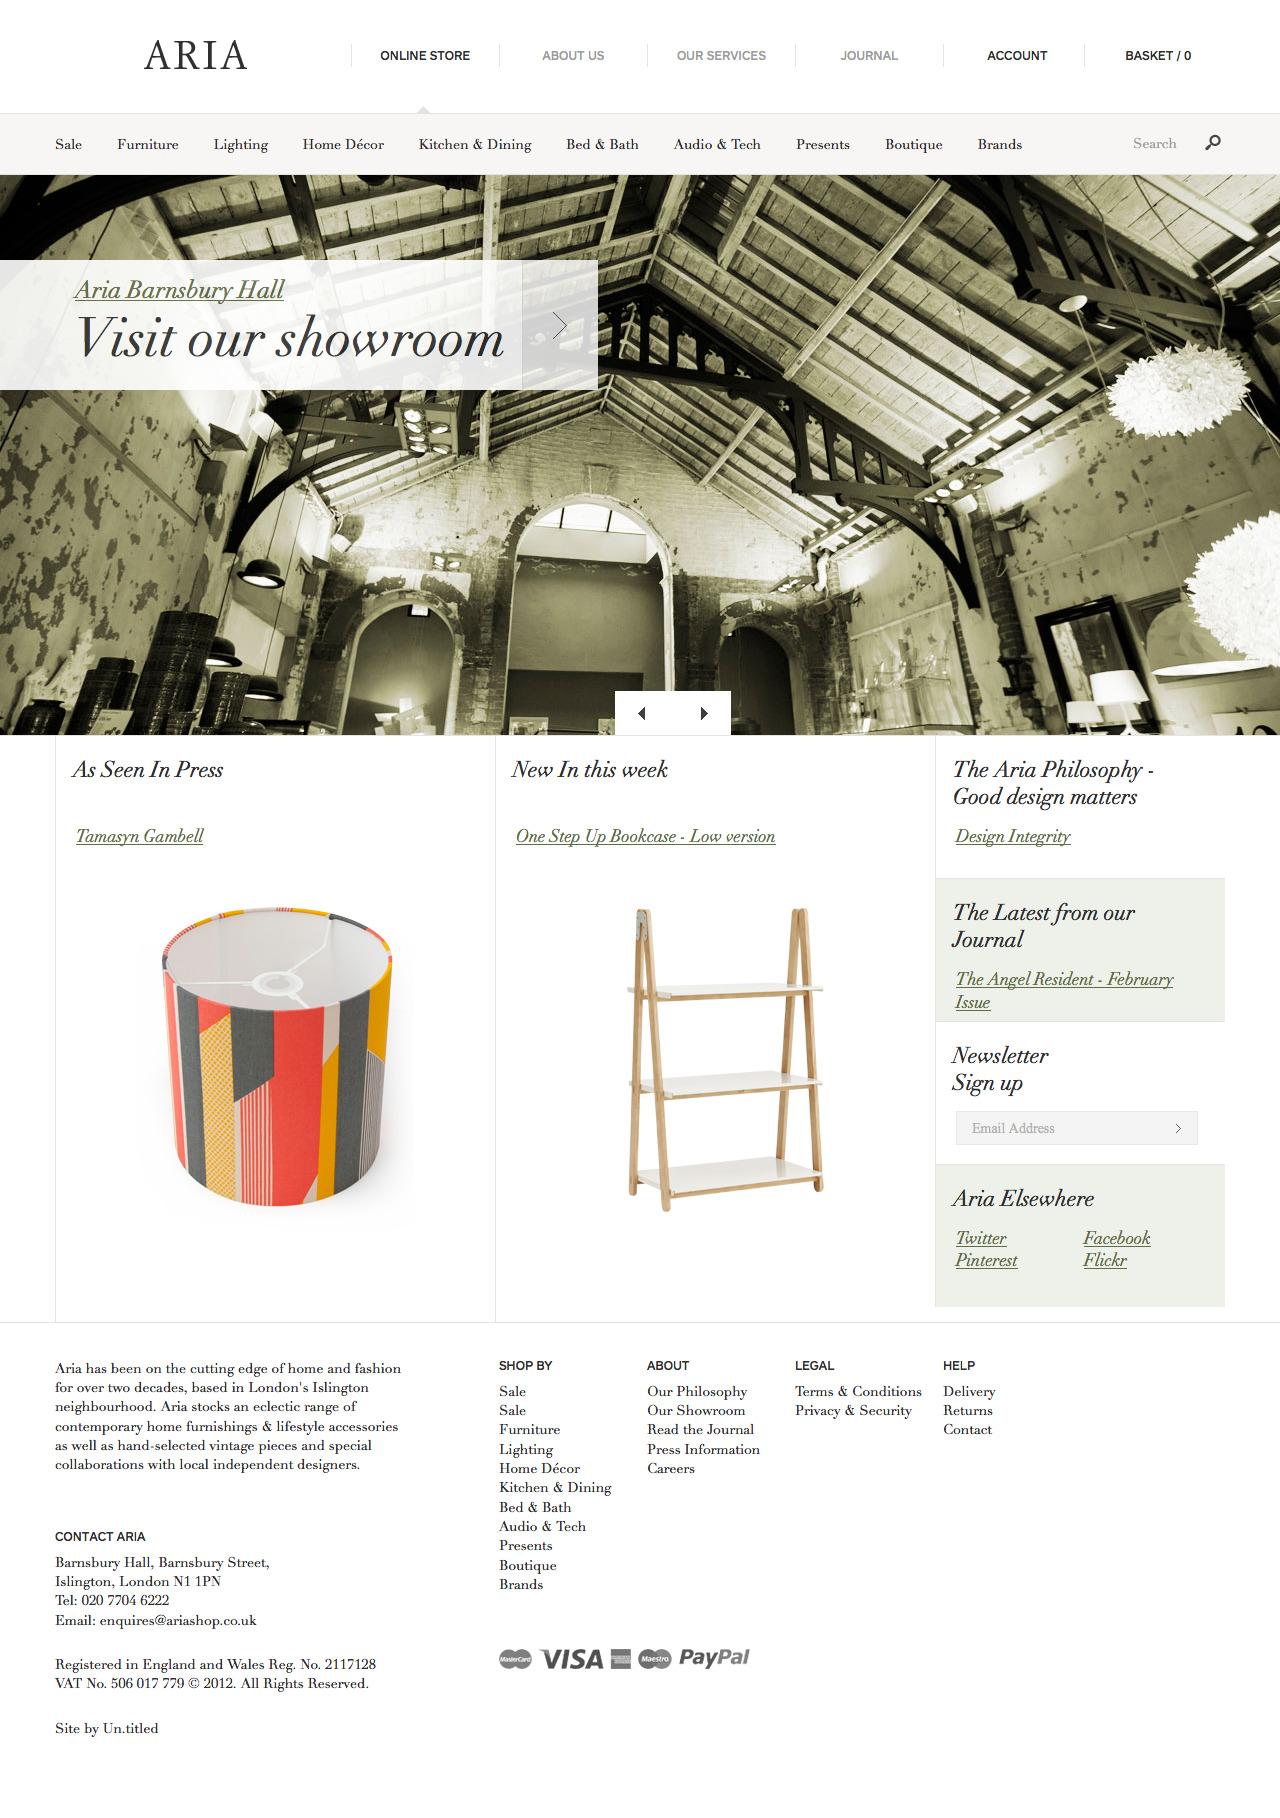 Contemporary Furniture, Design, Lighting & Home Accessories - Call 020 7704 6222 - Aria